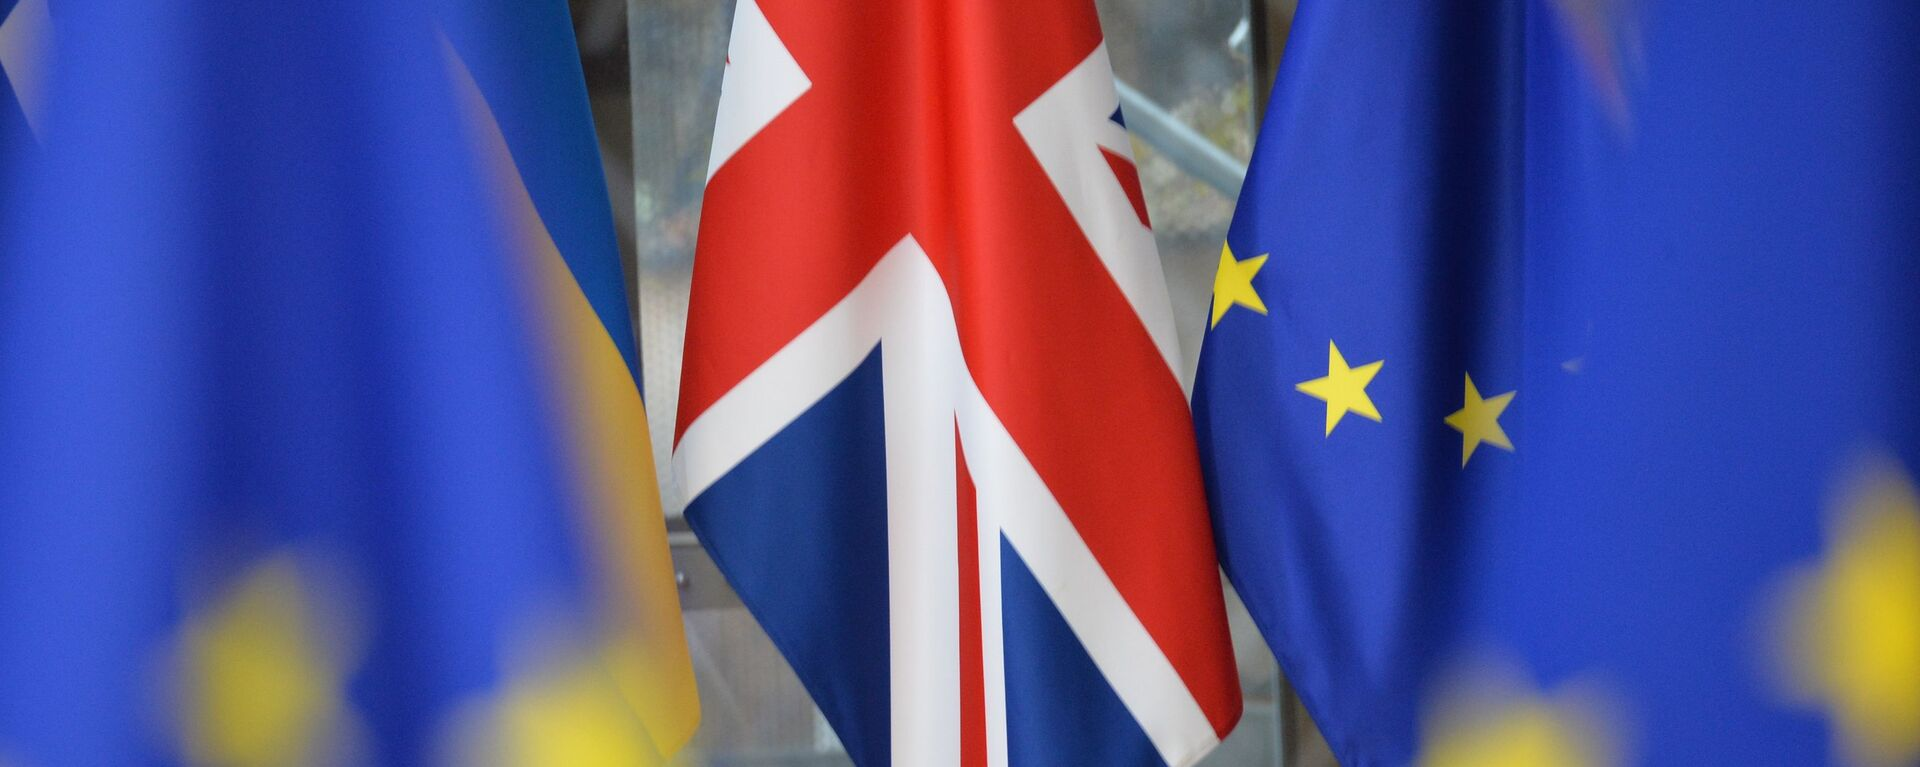 Флаг Великобритании на саммите ЕС в Брюсселе - Sputnik Узбекистан, 1920, 02.09.2021